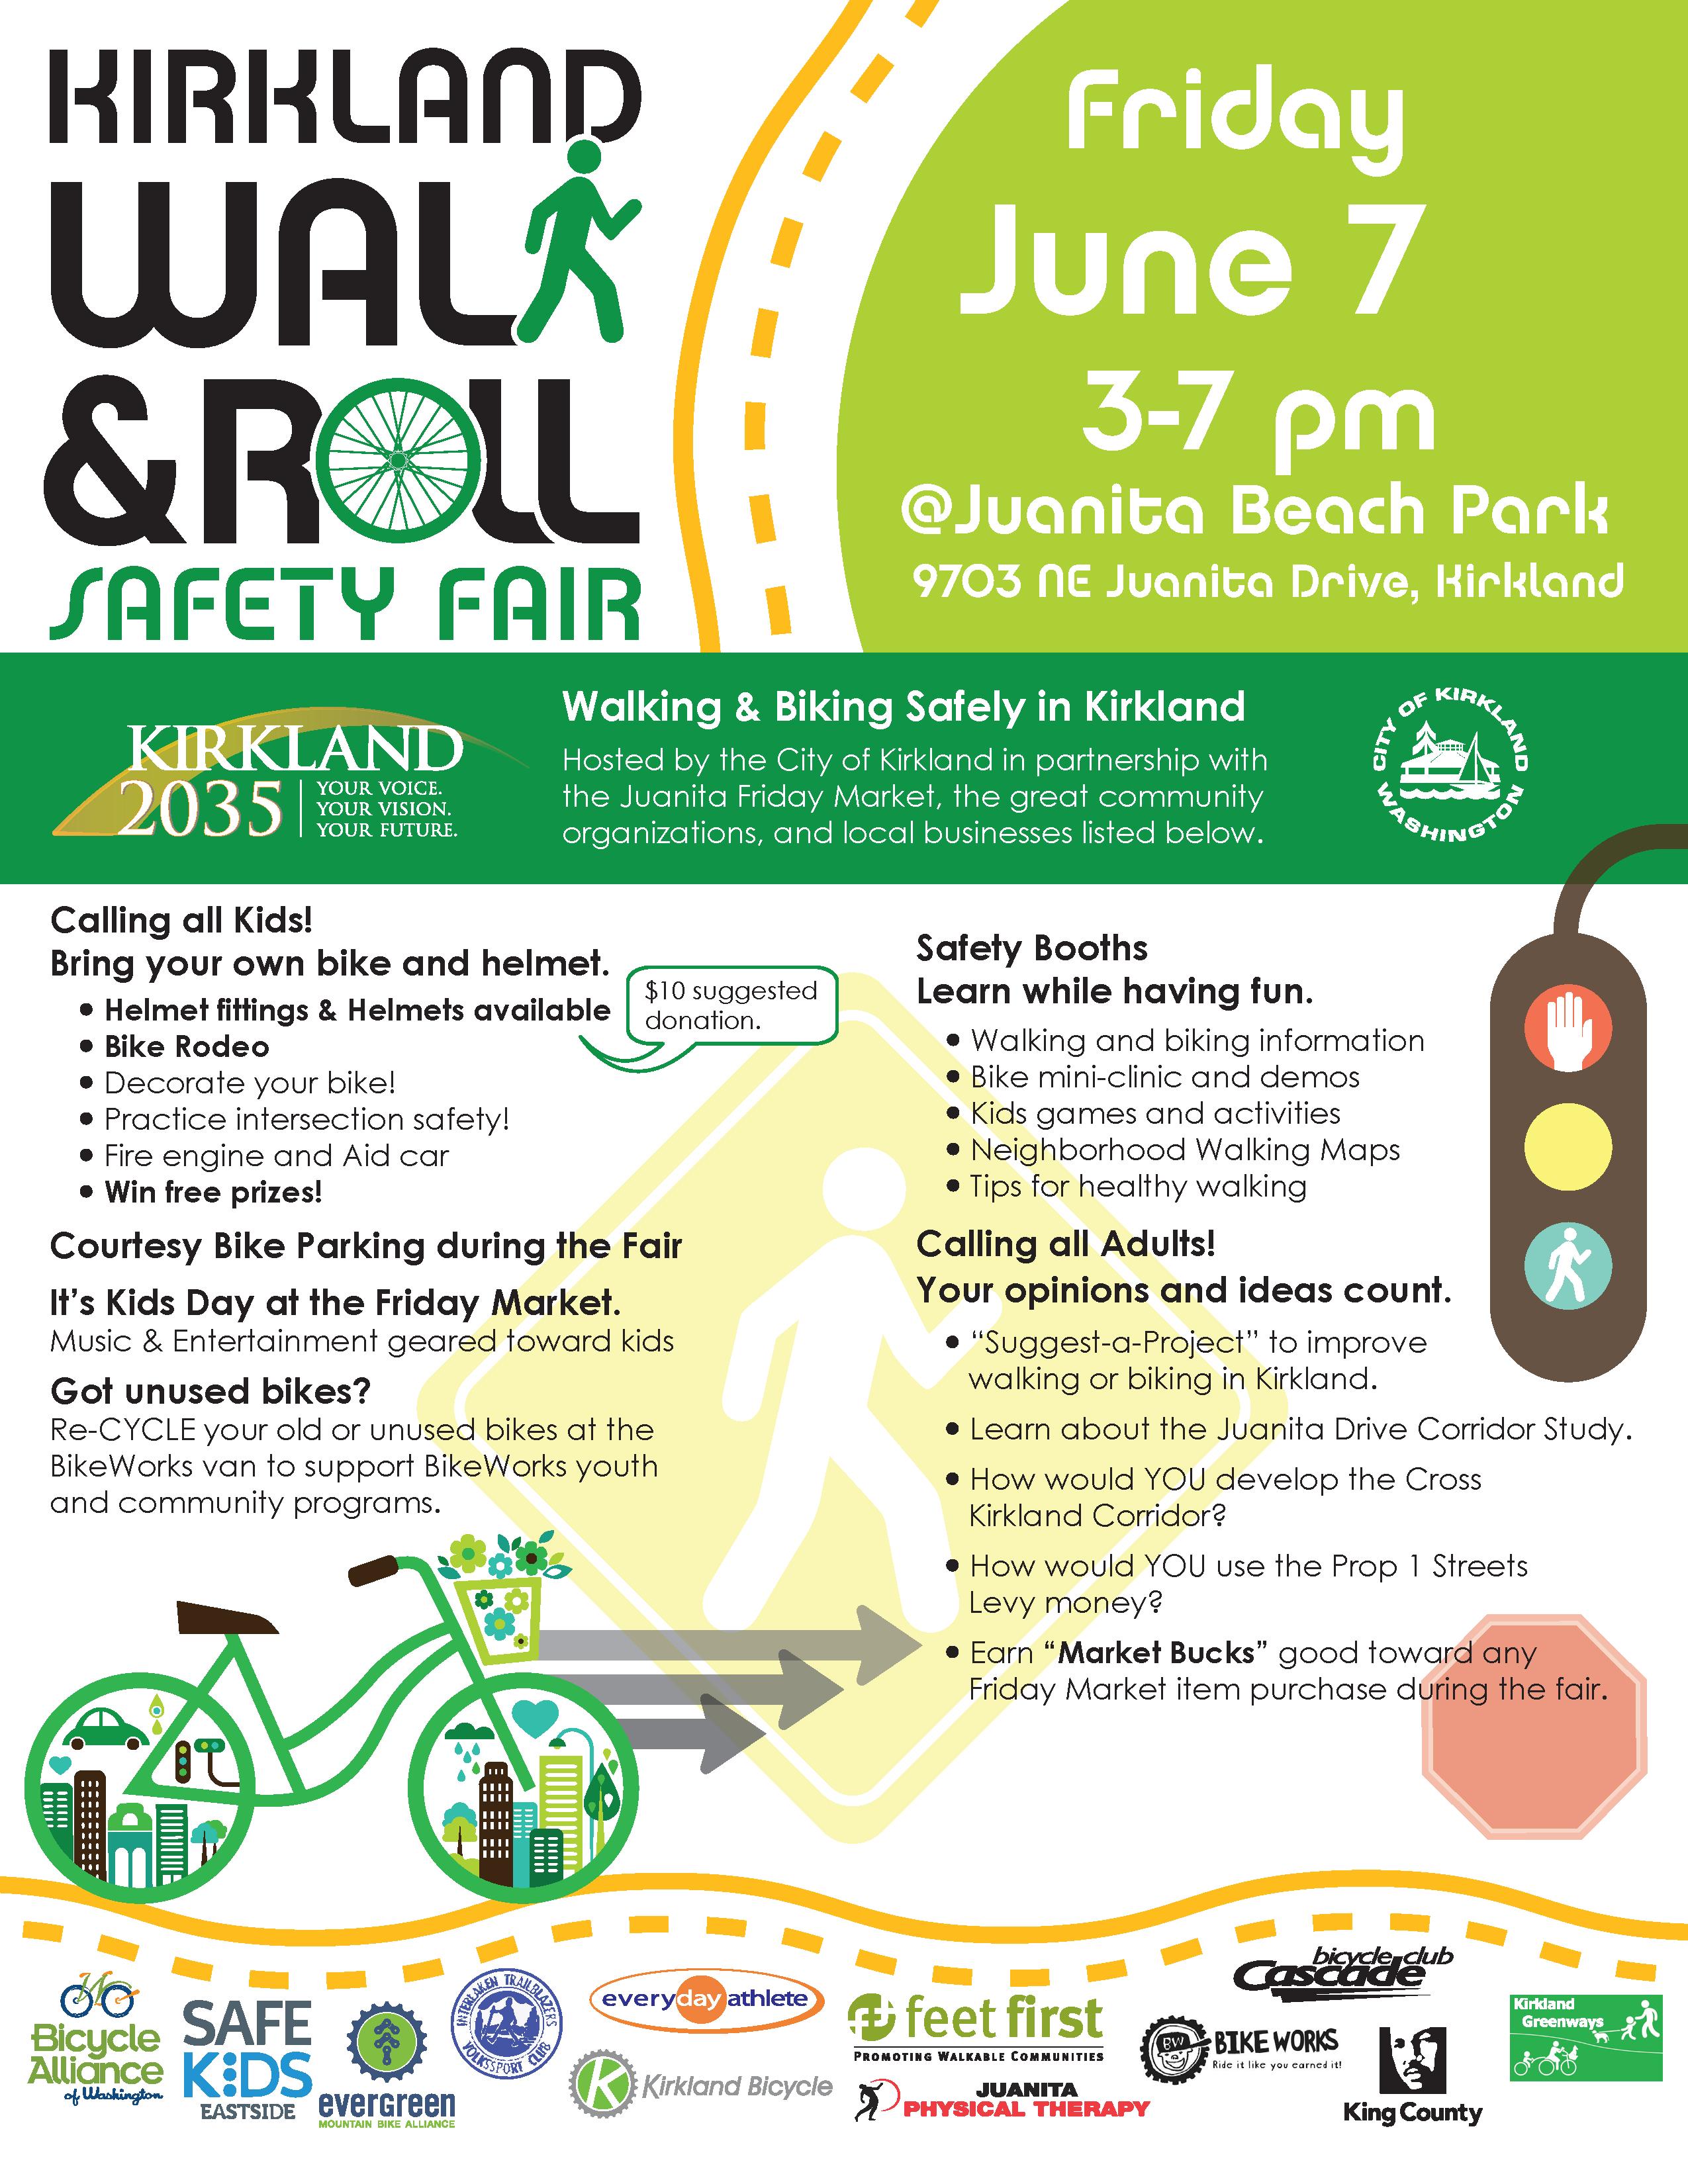 Kirkland Walk Amp Roll Safety Fair Is This Friday